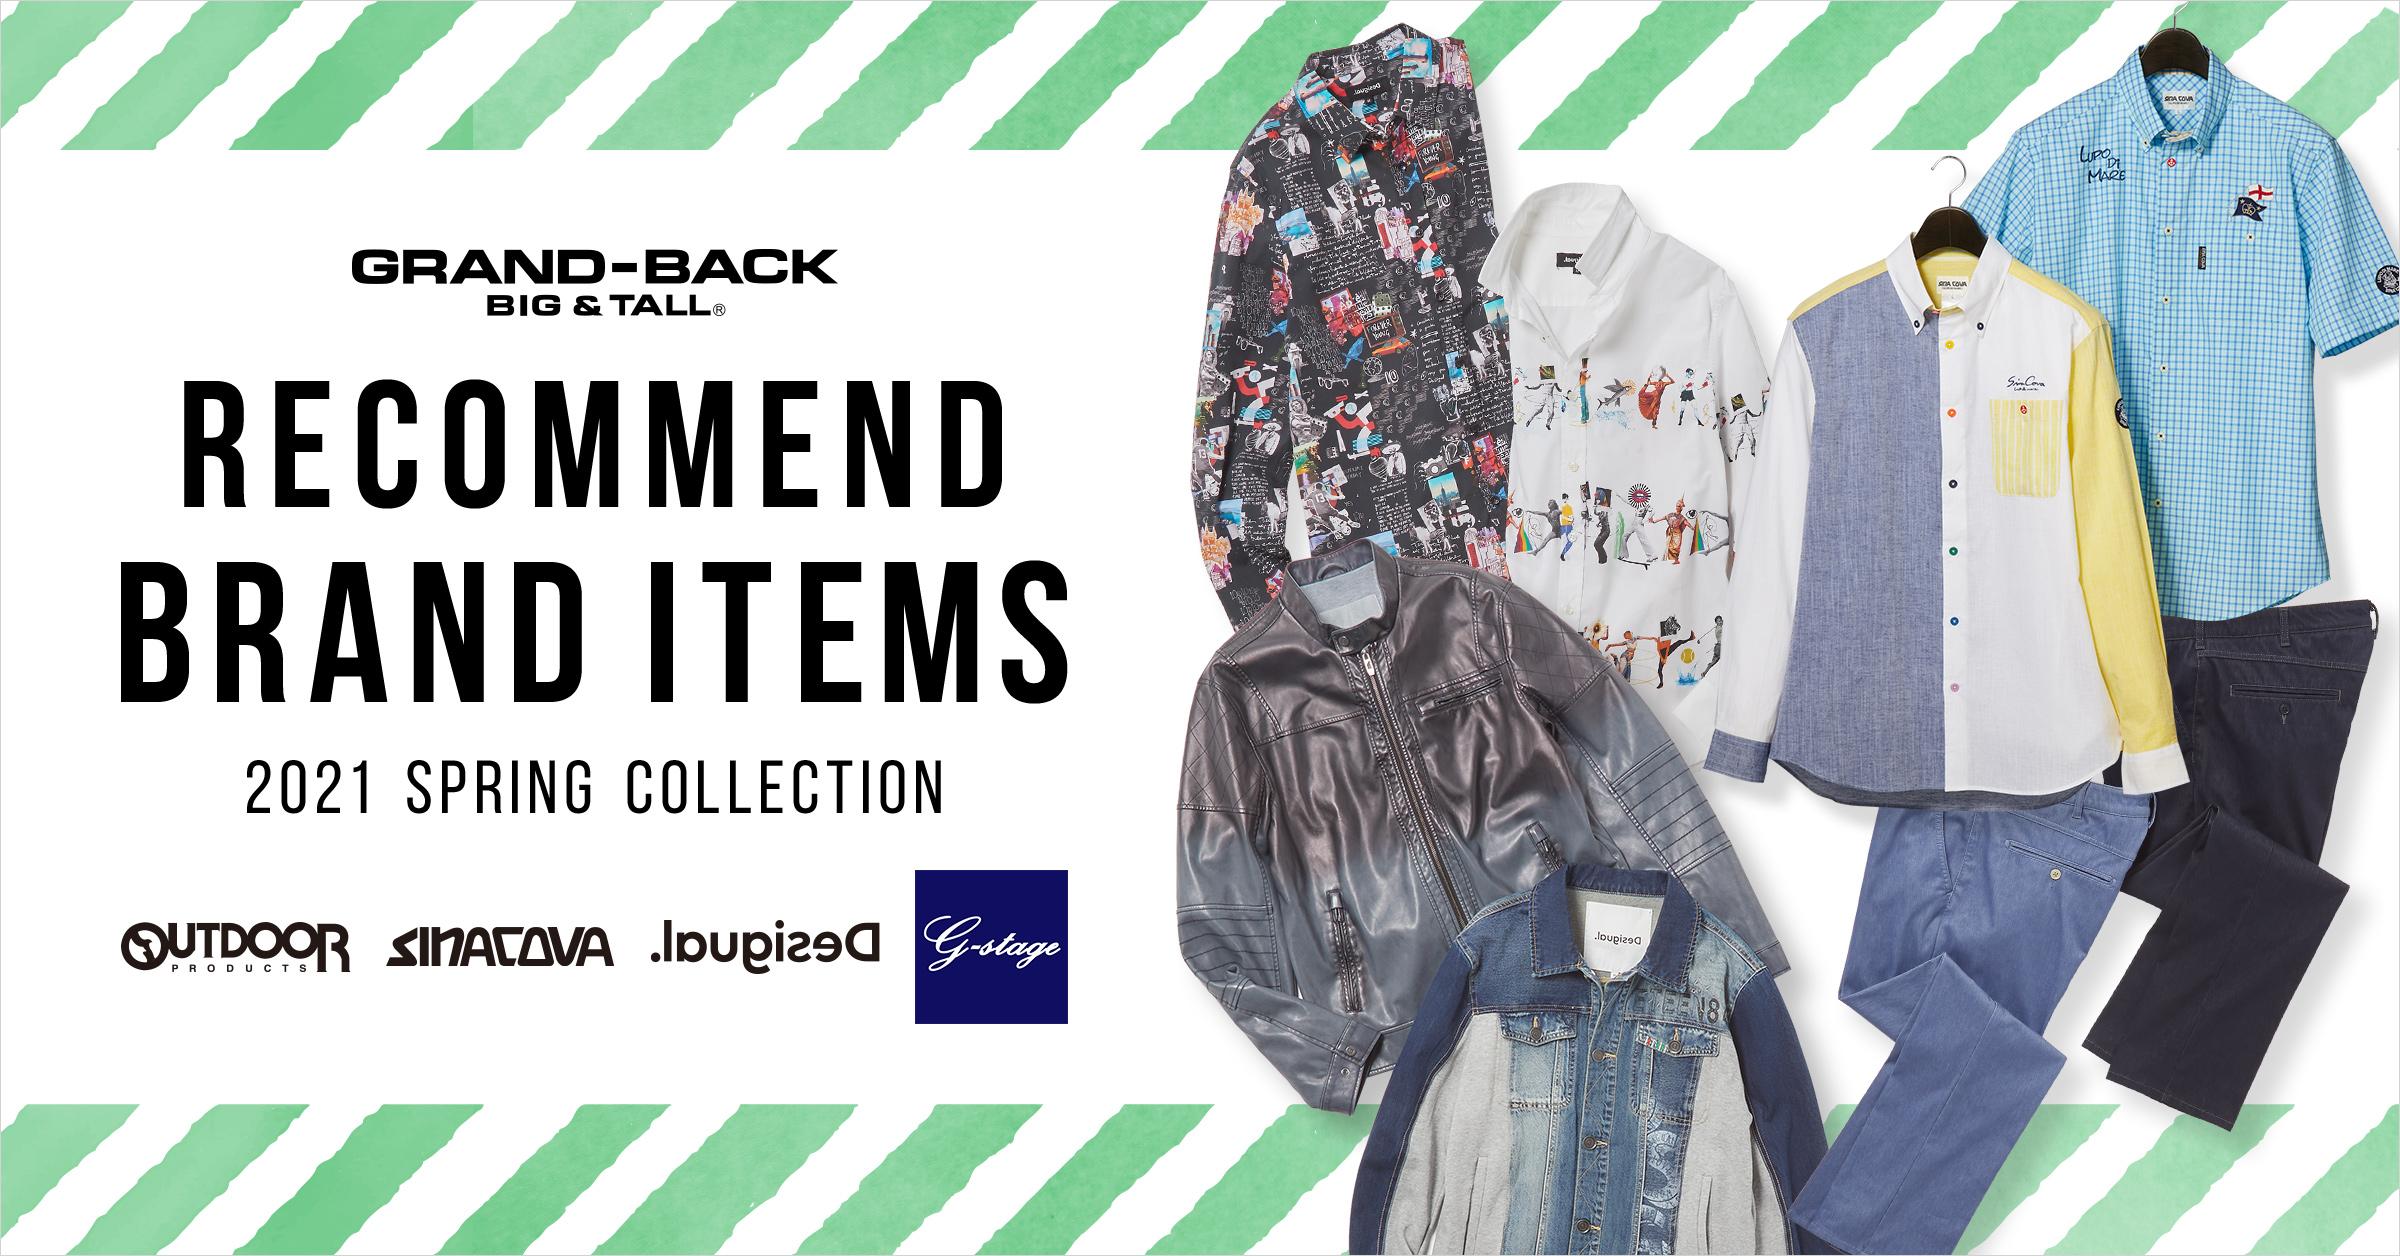 GRAND-BACK (グランバック) 2021 Spring Big-size Recommend Brand Items(2021 スプリング ビッグサイズ レコメンドブランドアイテム)